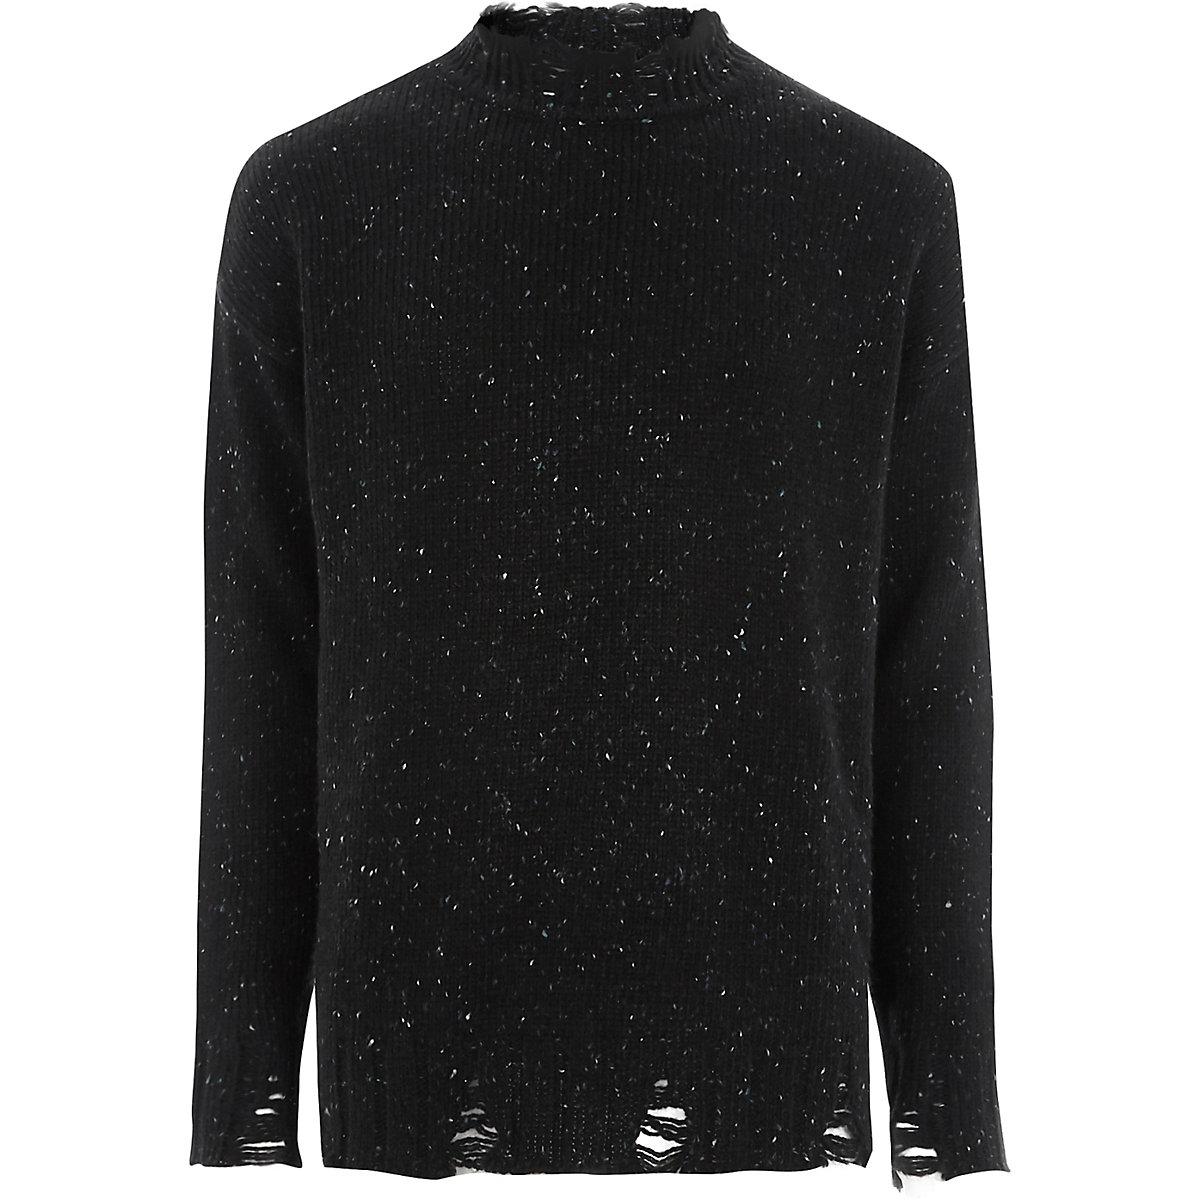 Black flecked knit crew neck jumper